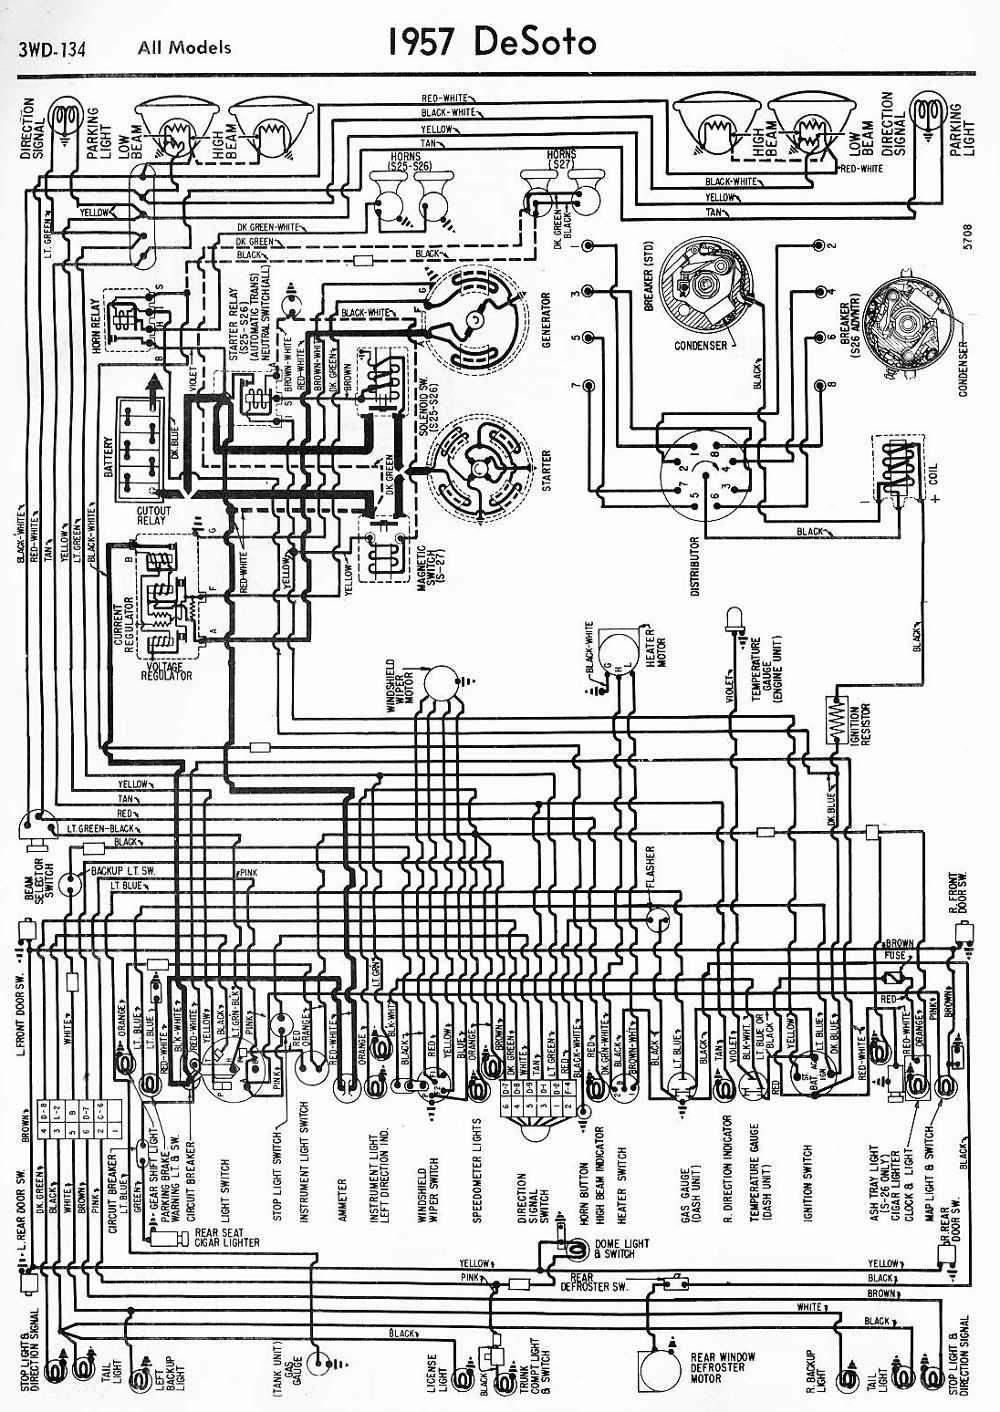 De Soto Car Pdf Manual Wiring Diagram Fault Codes Dtc